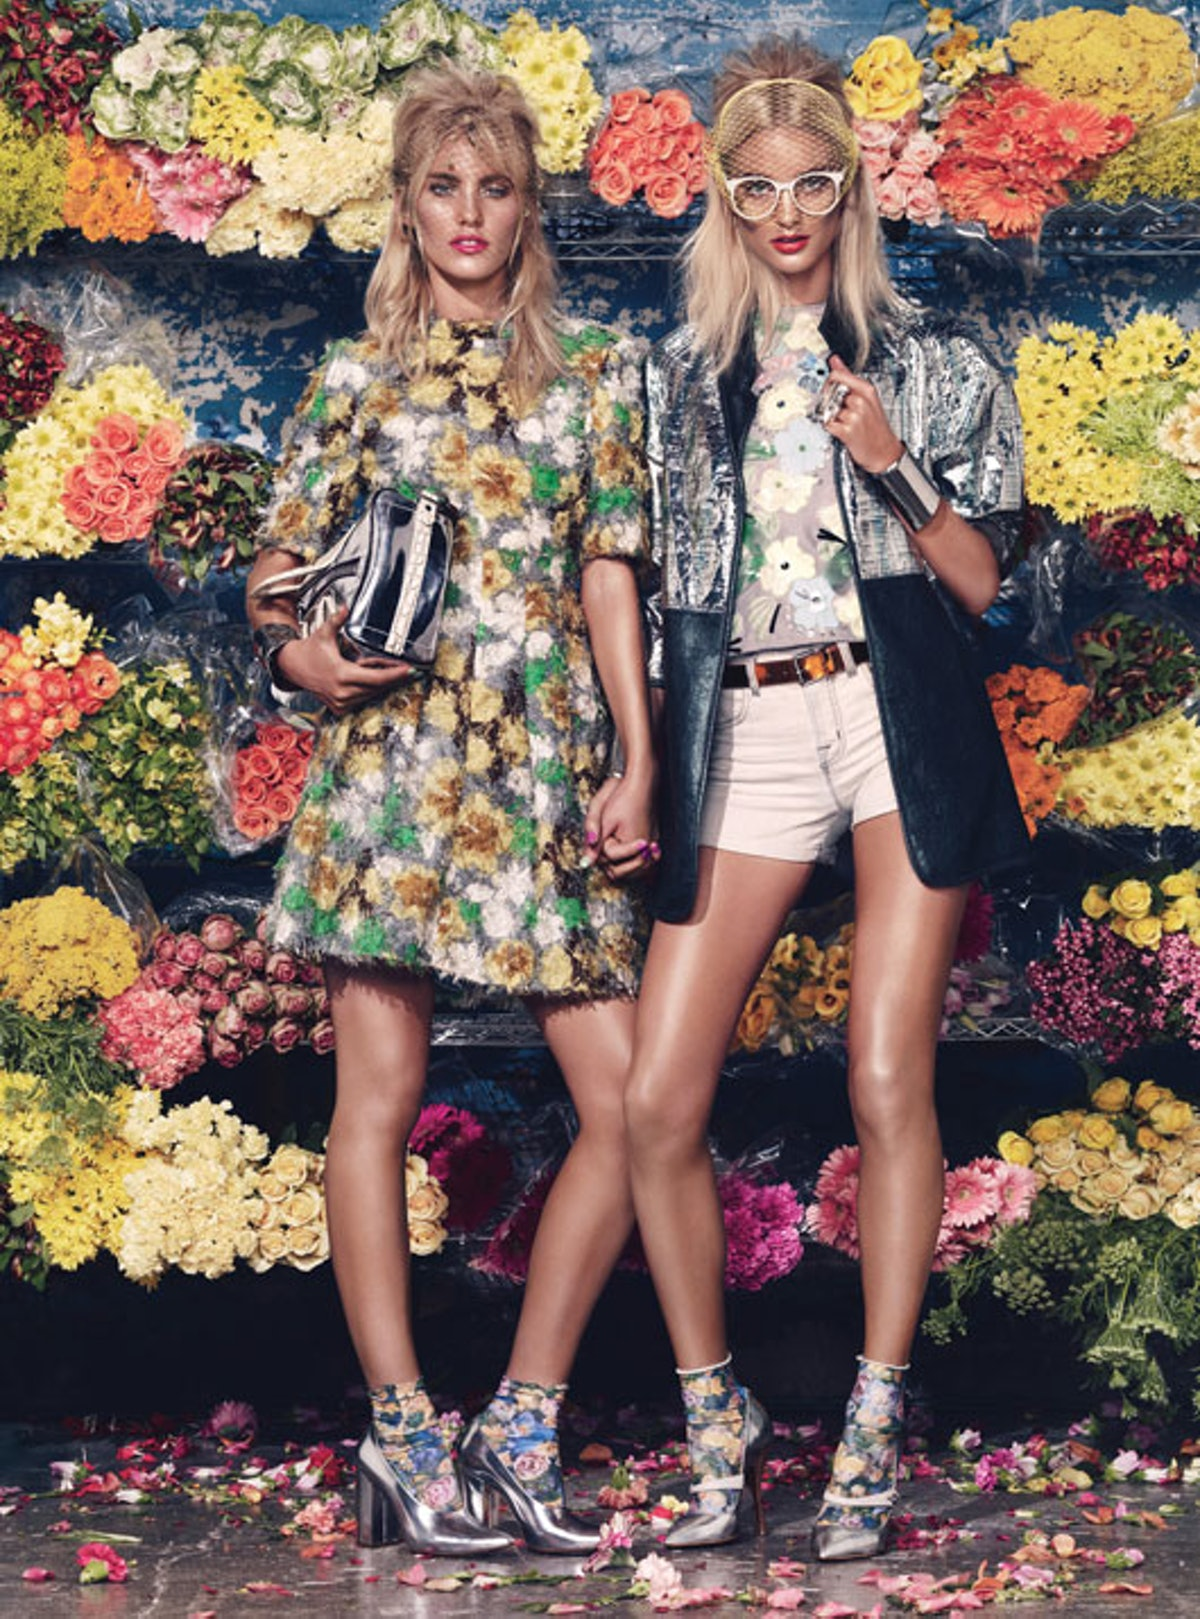 fass-floral-fashion-02-l.jpg